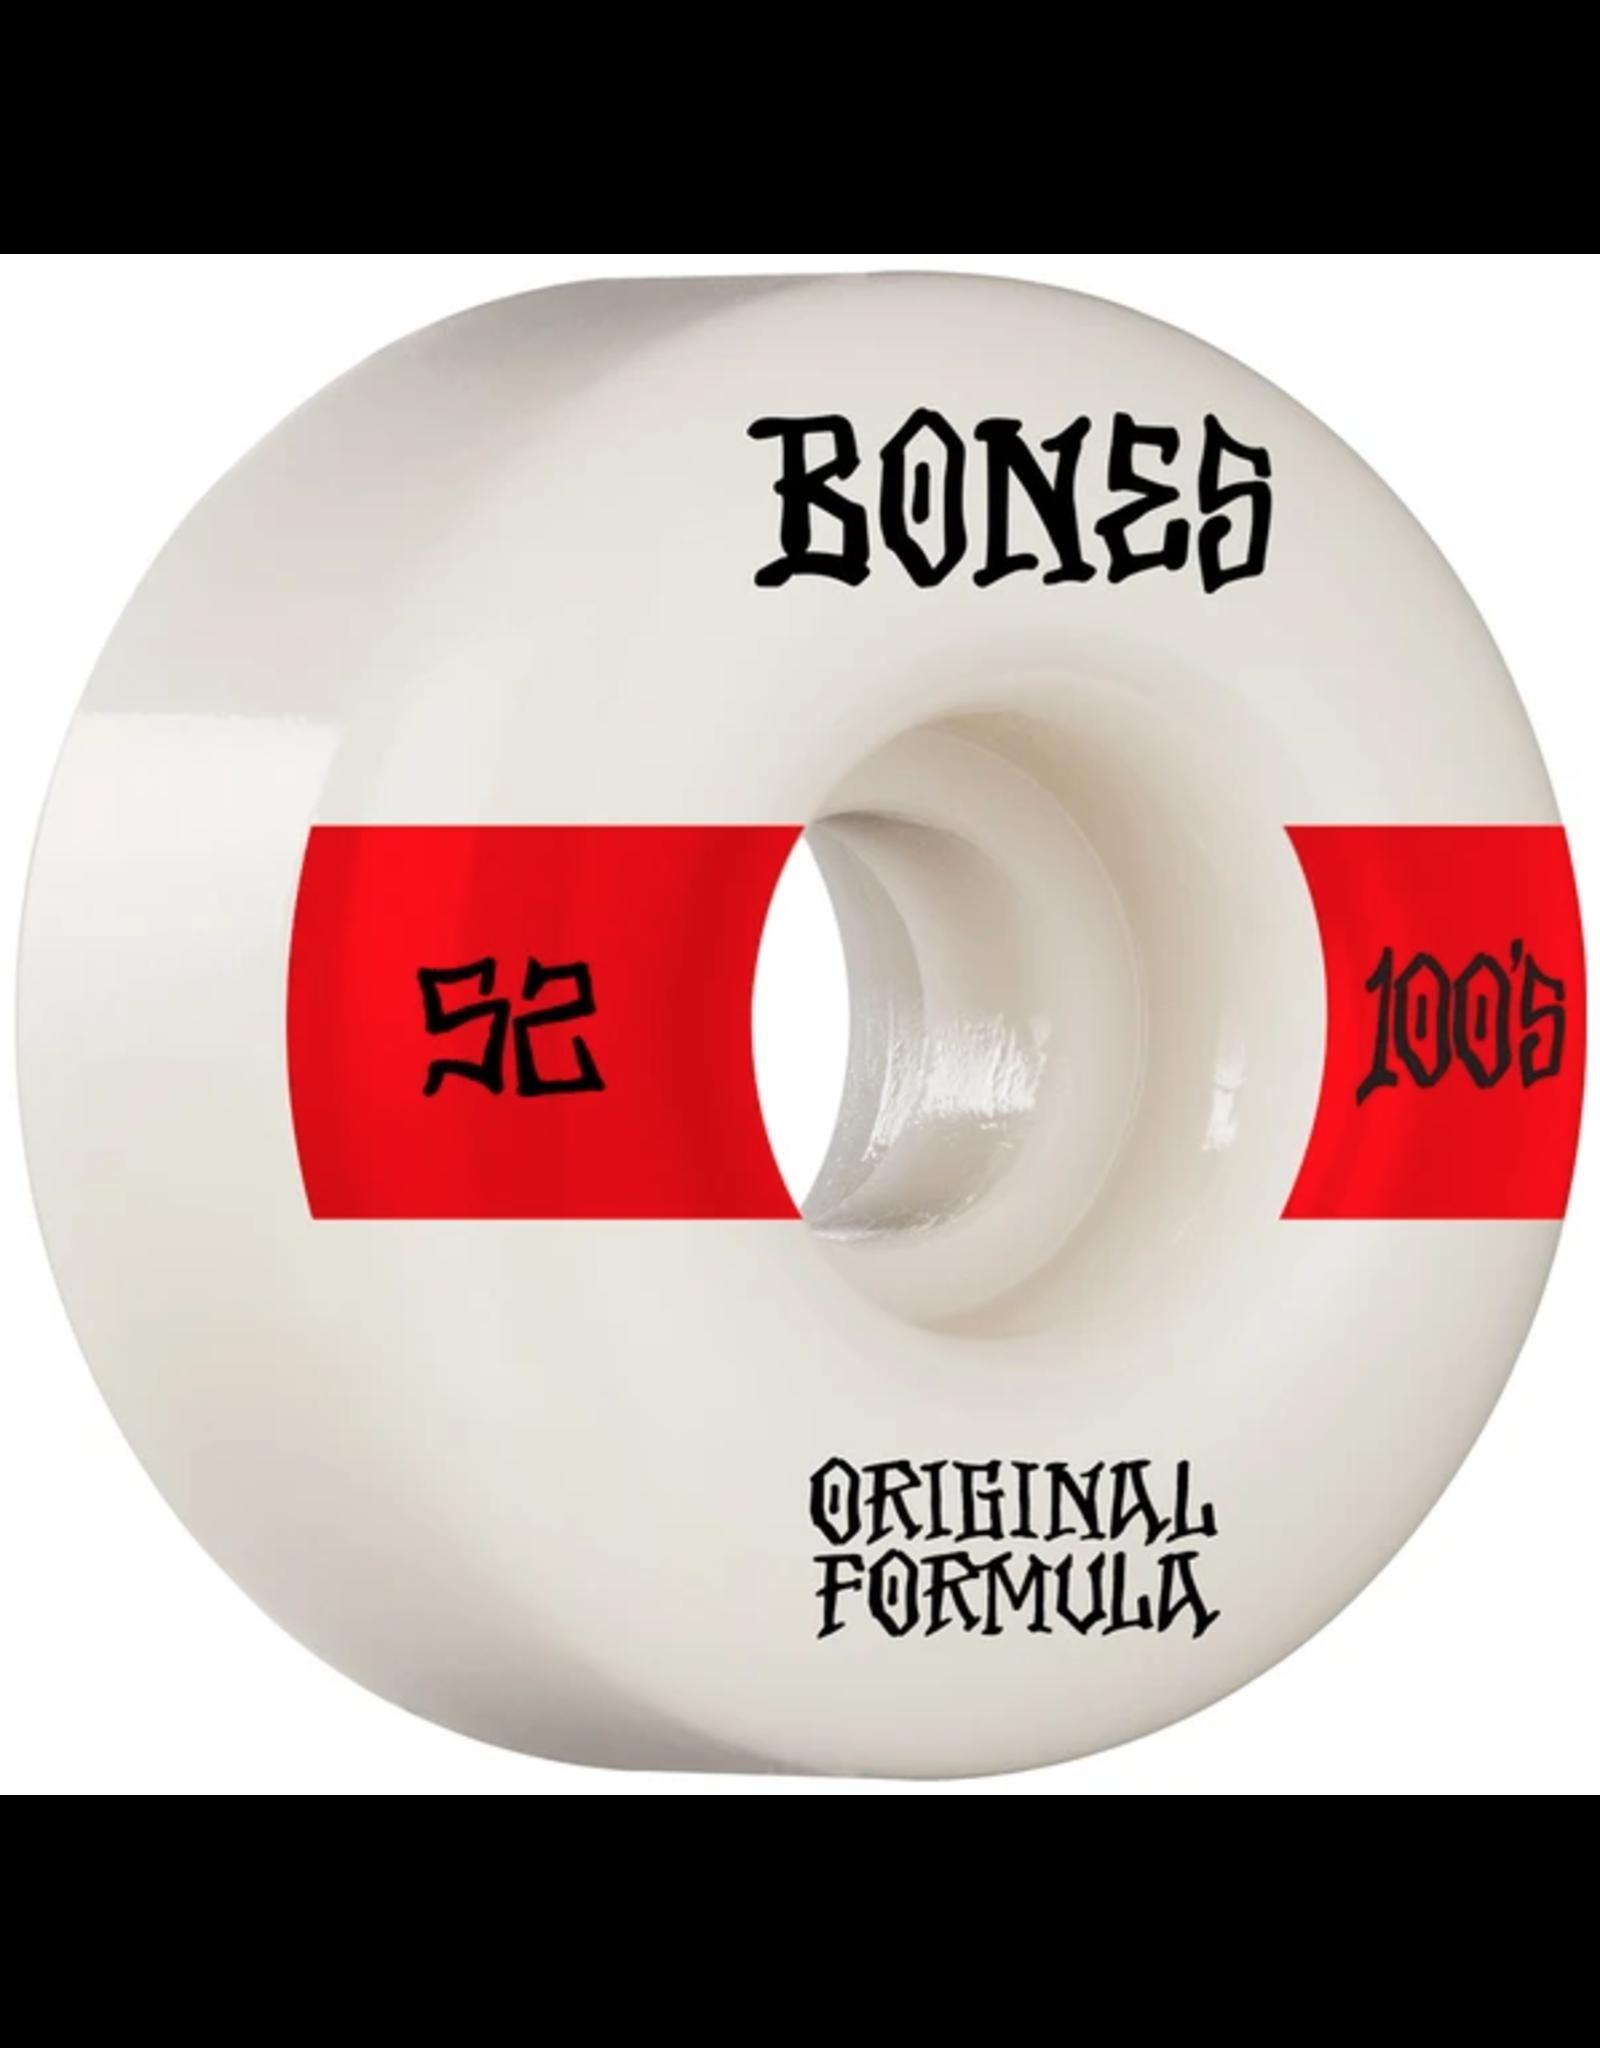 Bones Price Point V4 Wides 100's - Various Sizes white